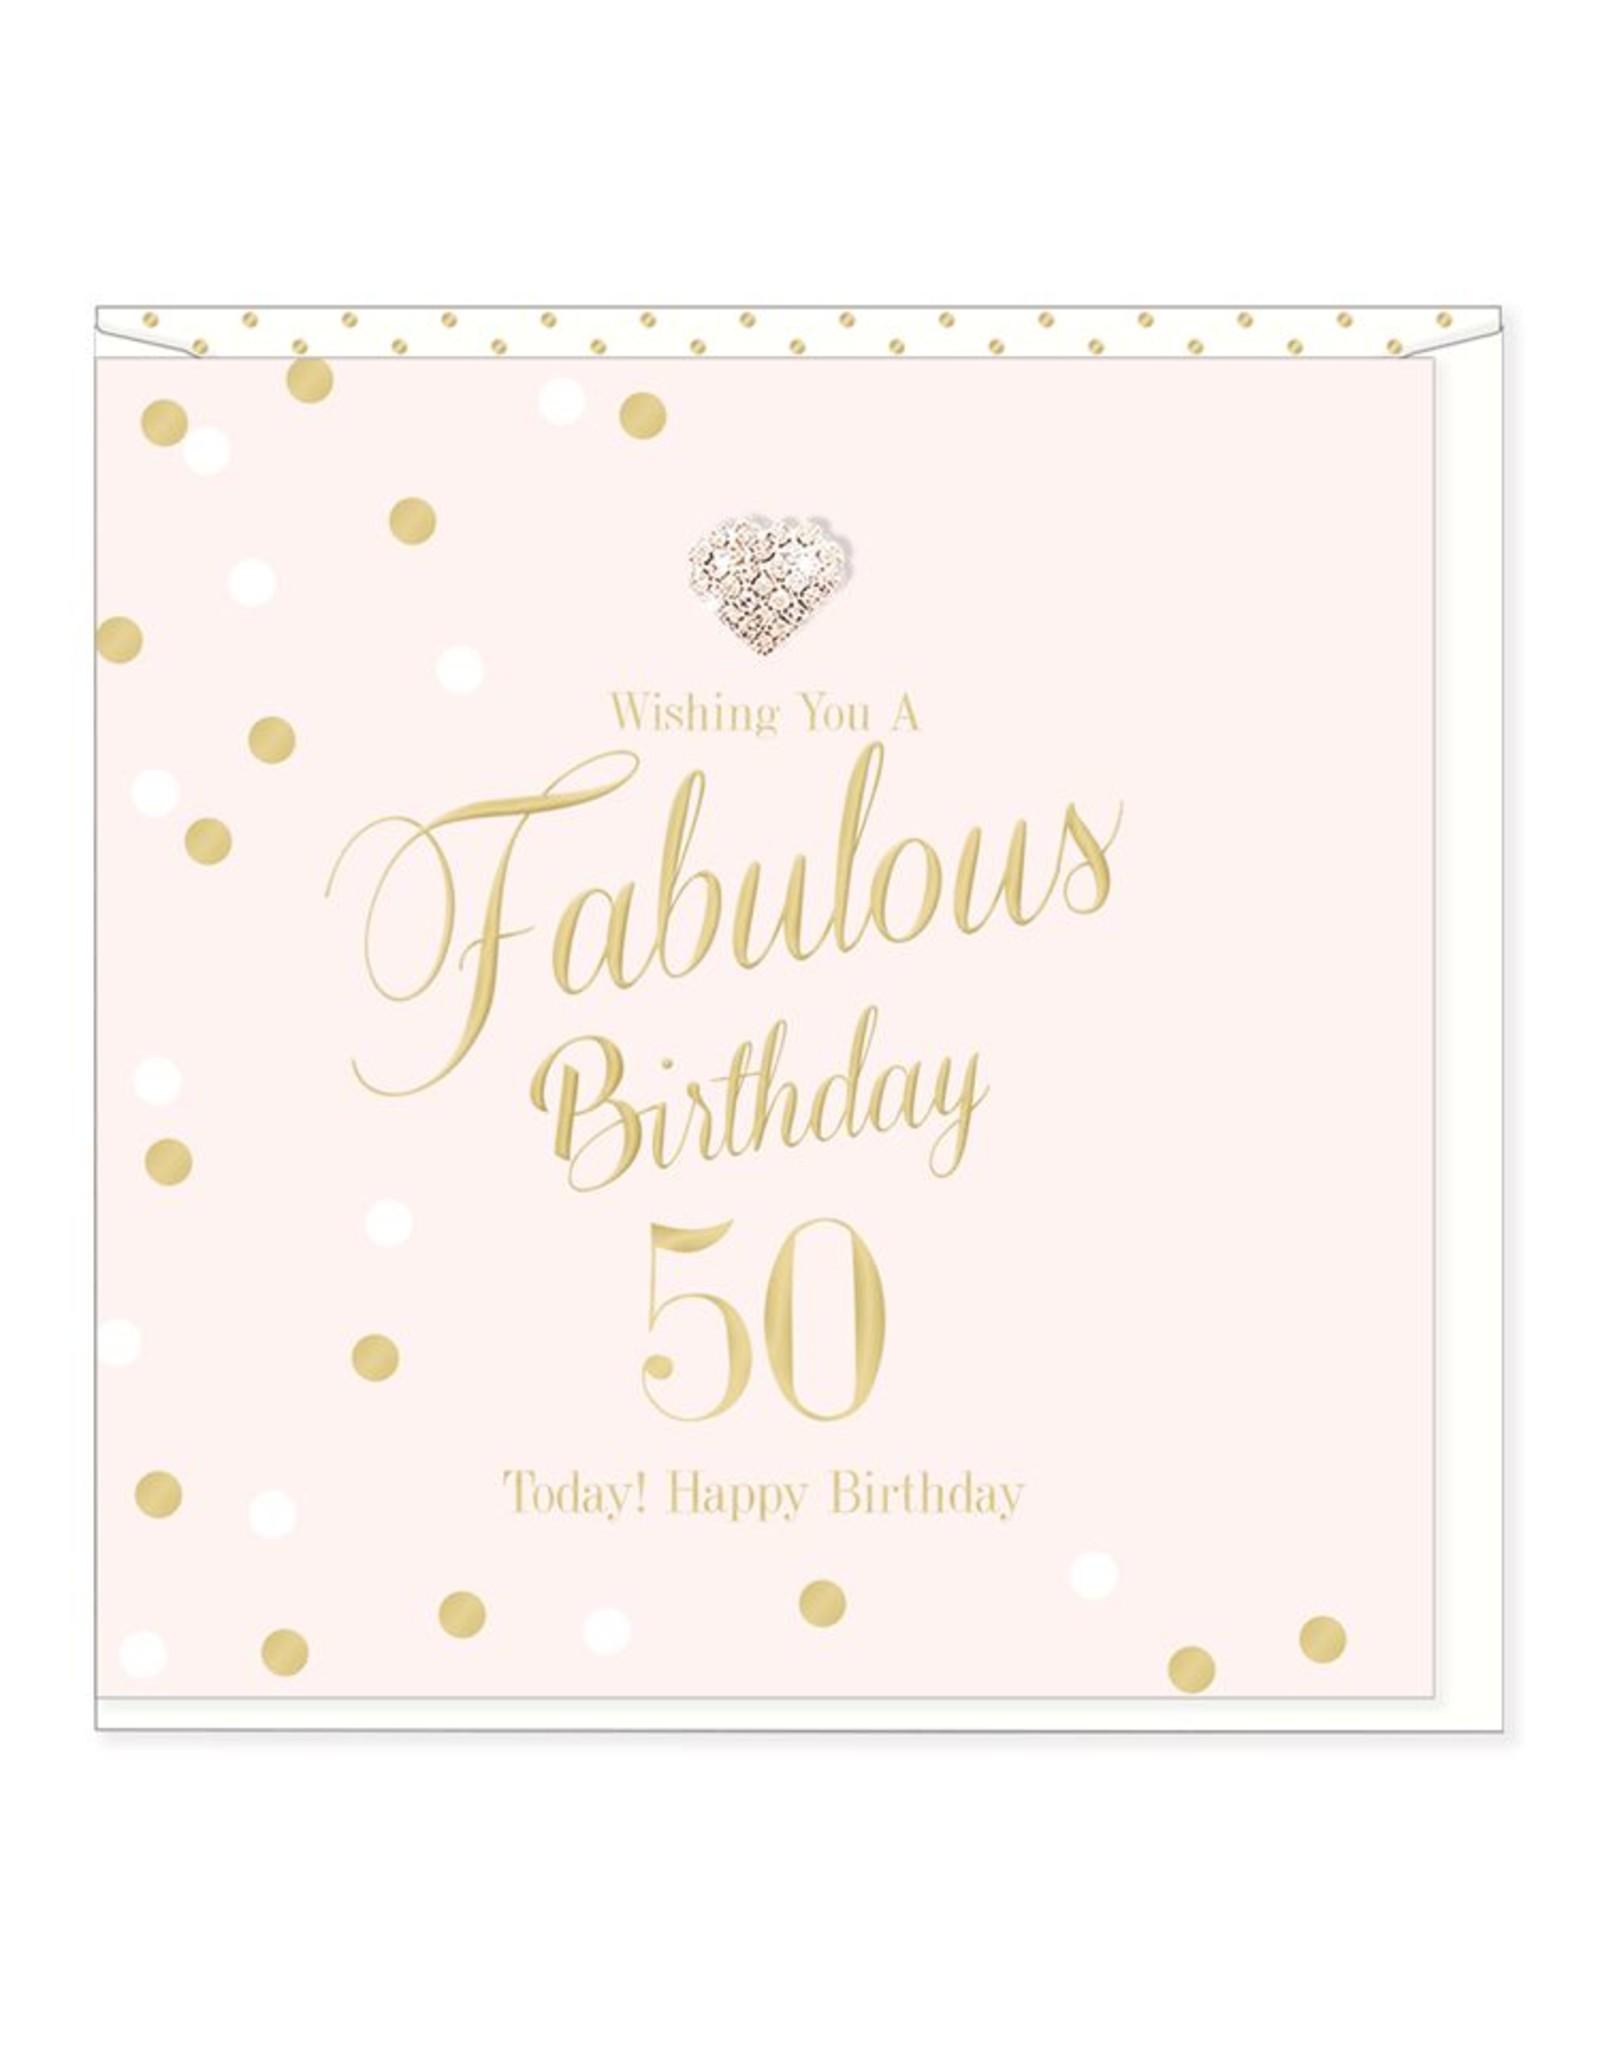 Hearts Design Fabulous Birthday - 50